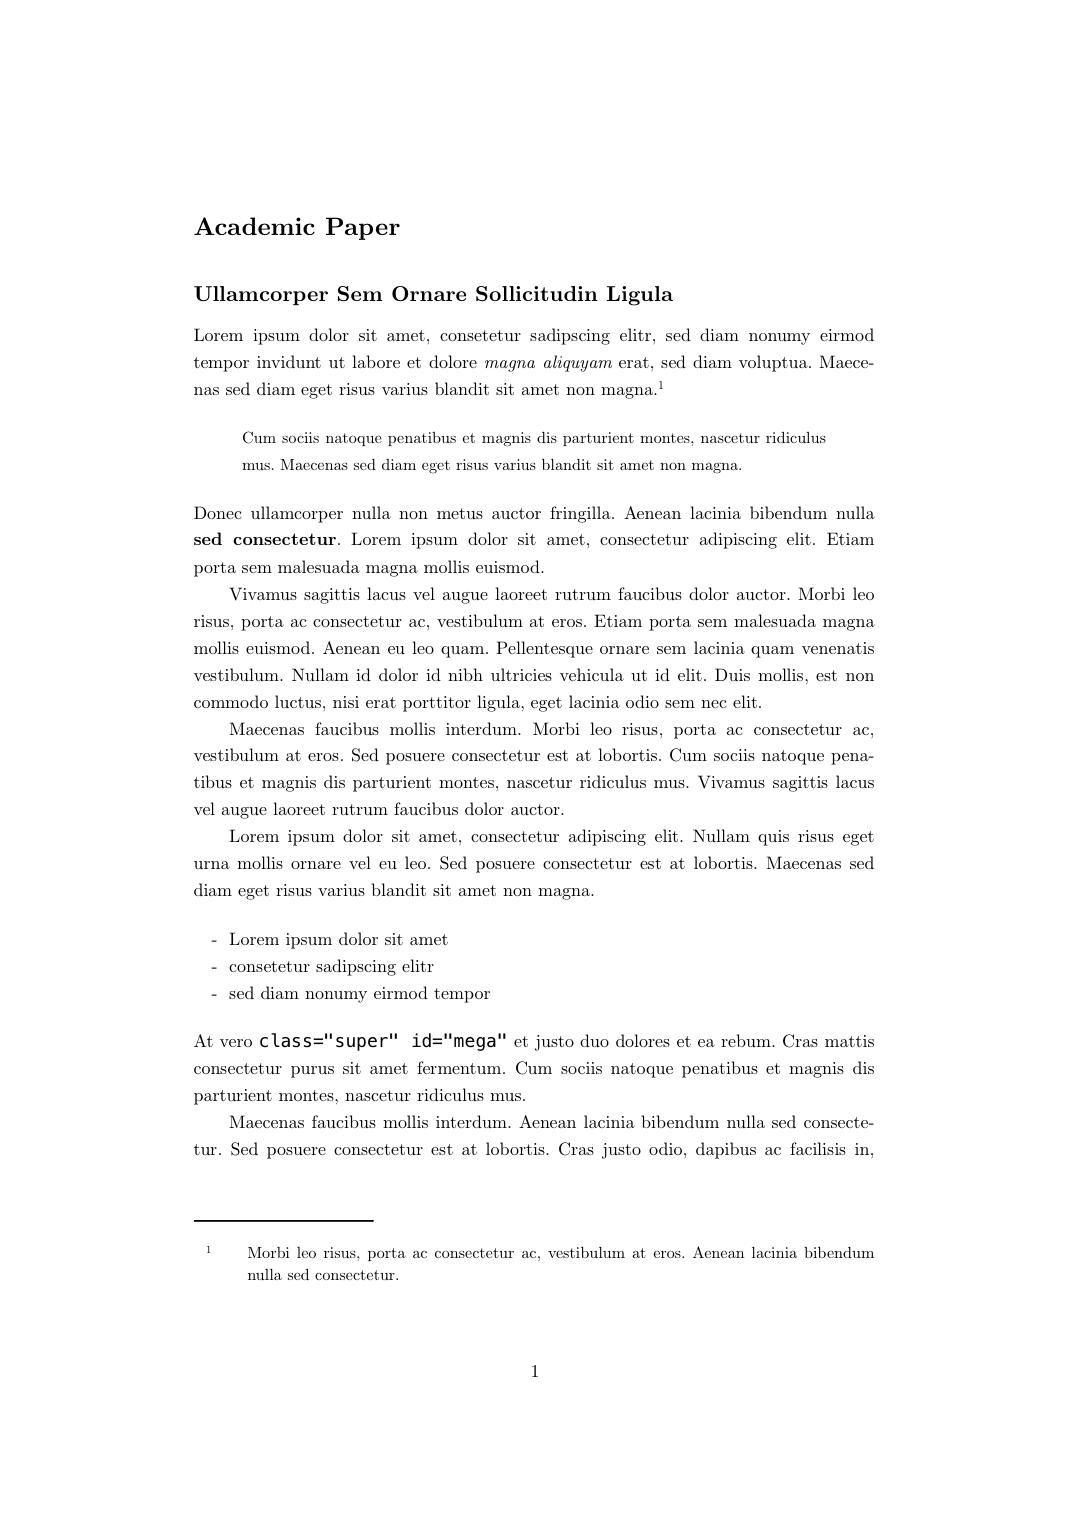 002 Academic Style Essay Example Fascinating Formal University Samples Harvard Full